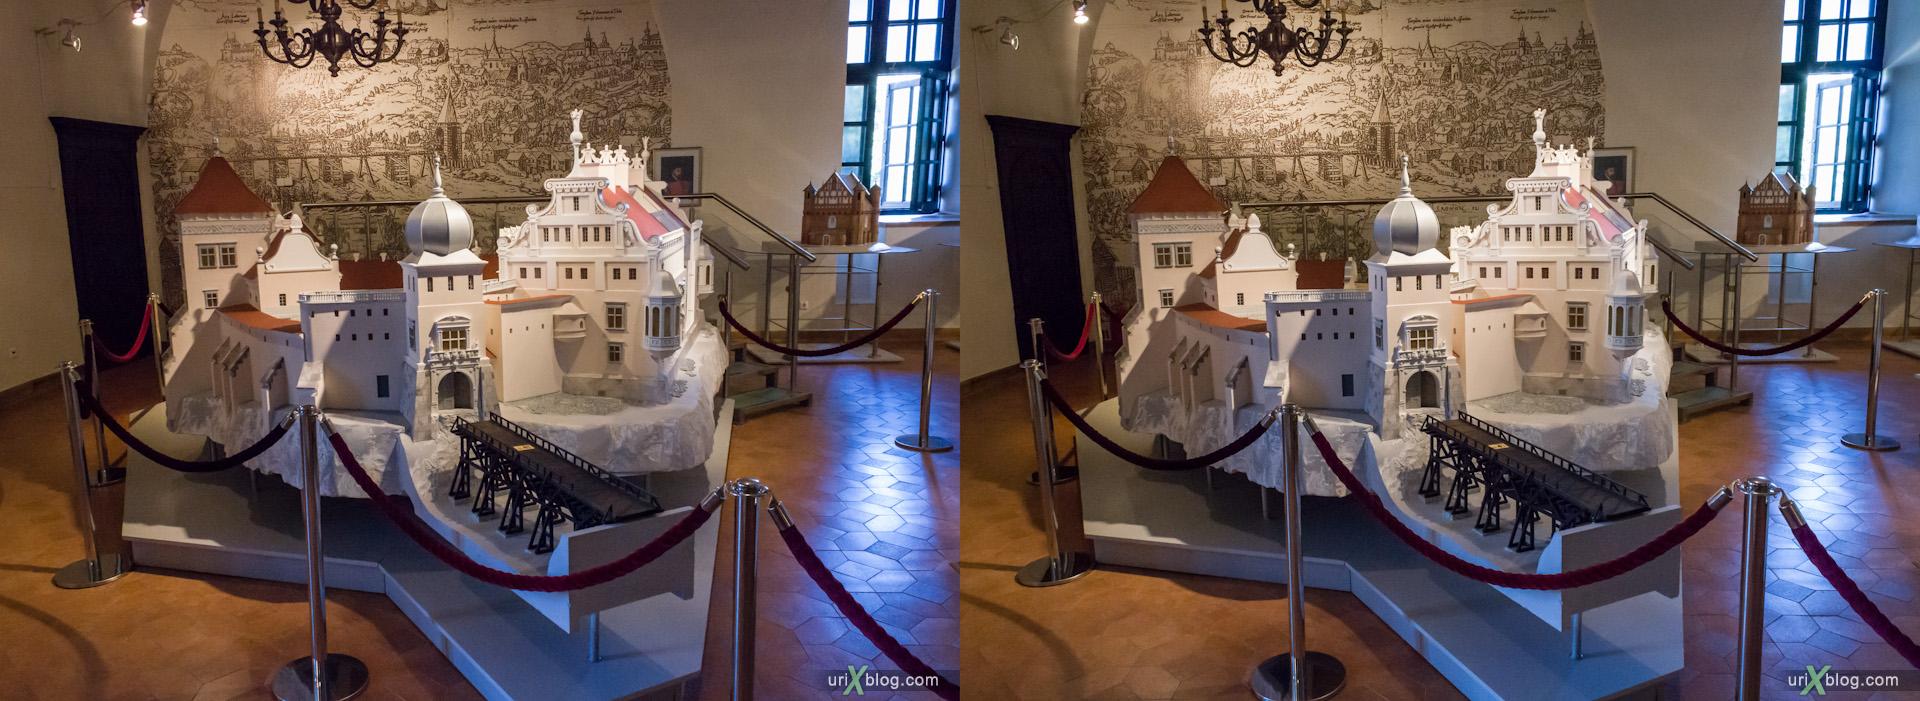 2012 Мирский замок Minsk Минск Белоруссия, Беларусь Belarus Belorussia стерео 3д stereo 3d